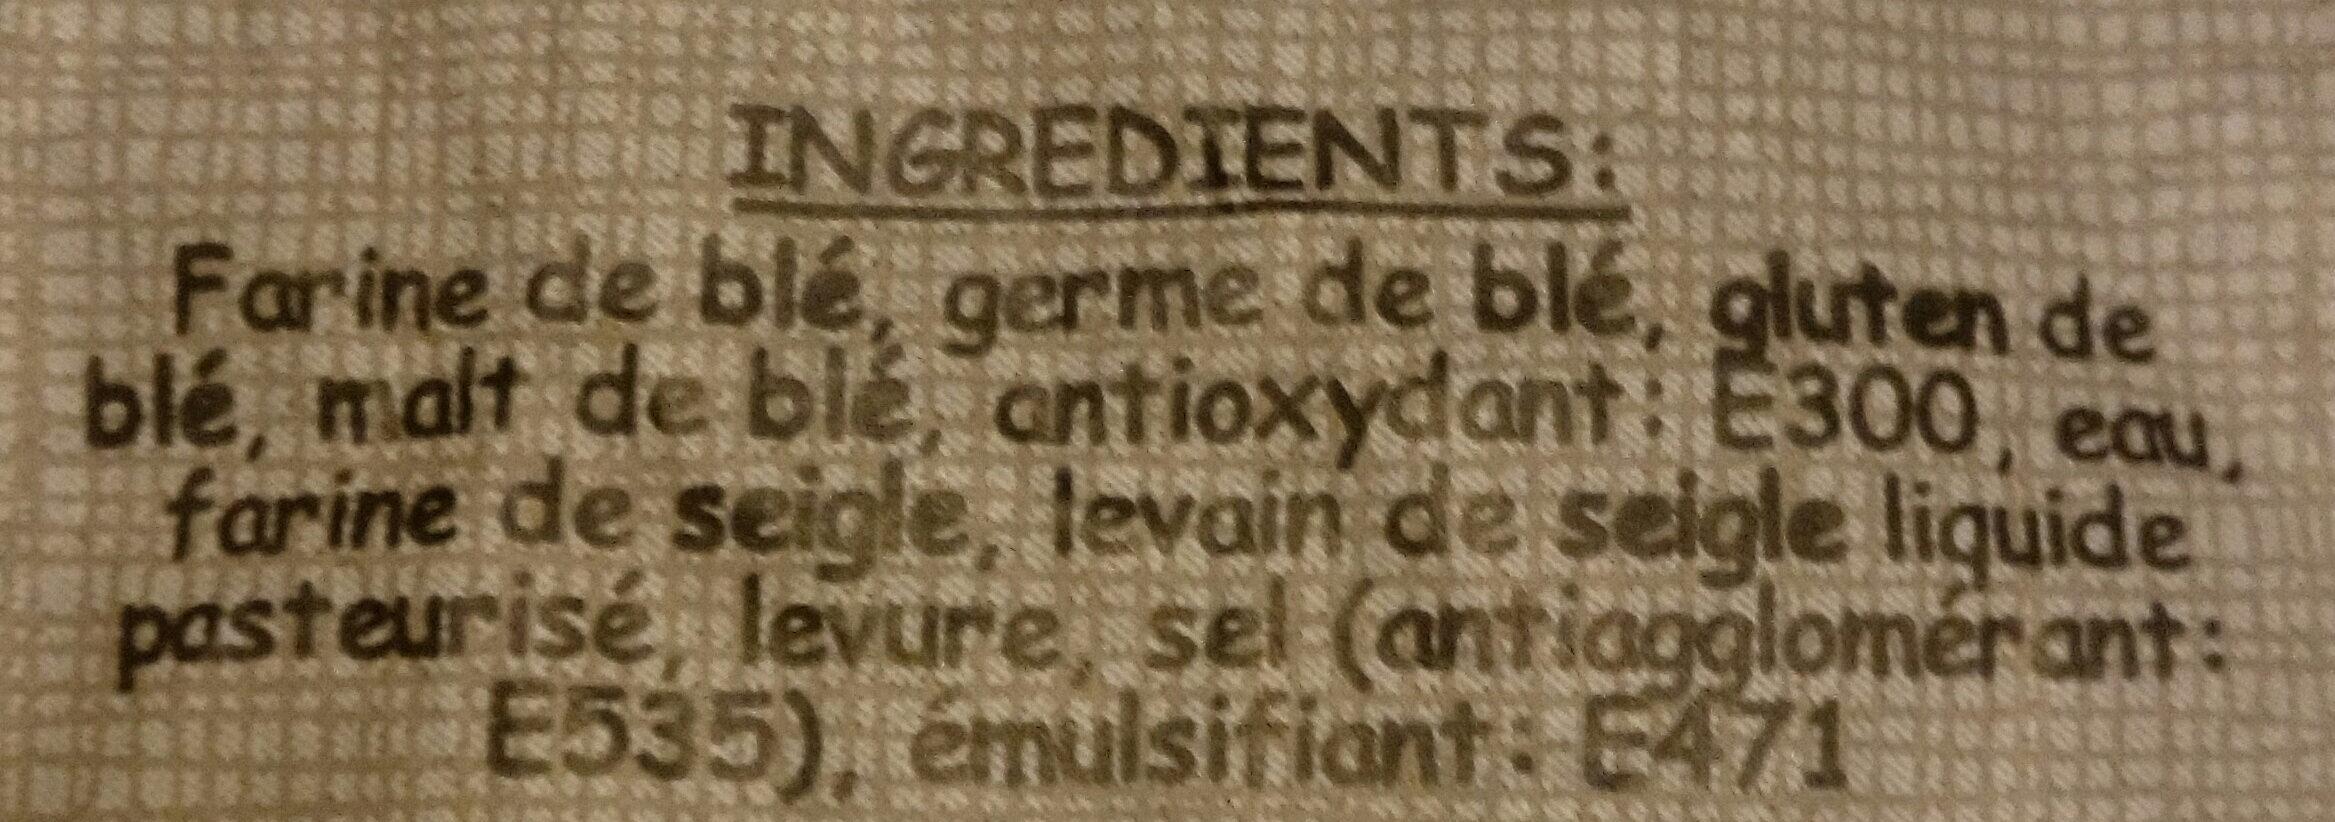 Baguette mont d'or - Ingrediënten